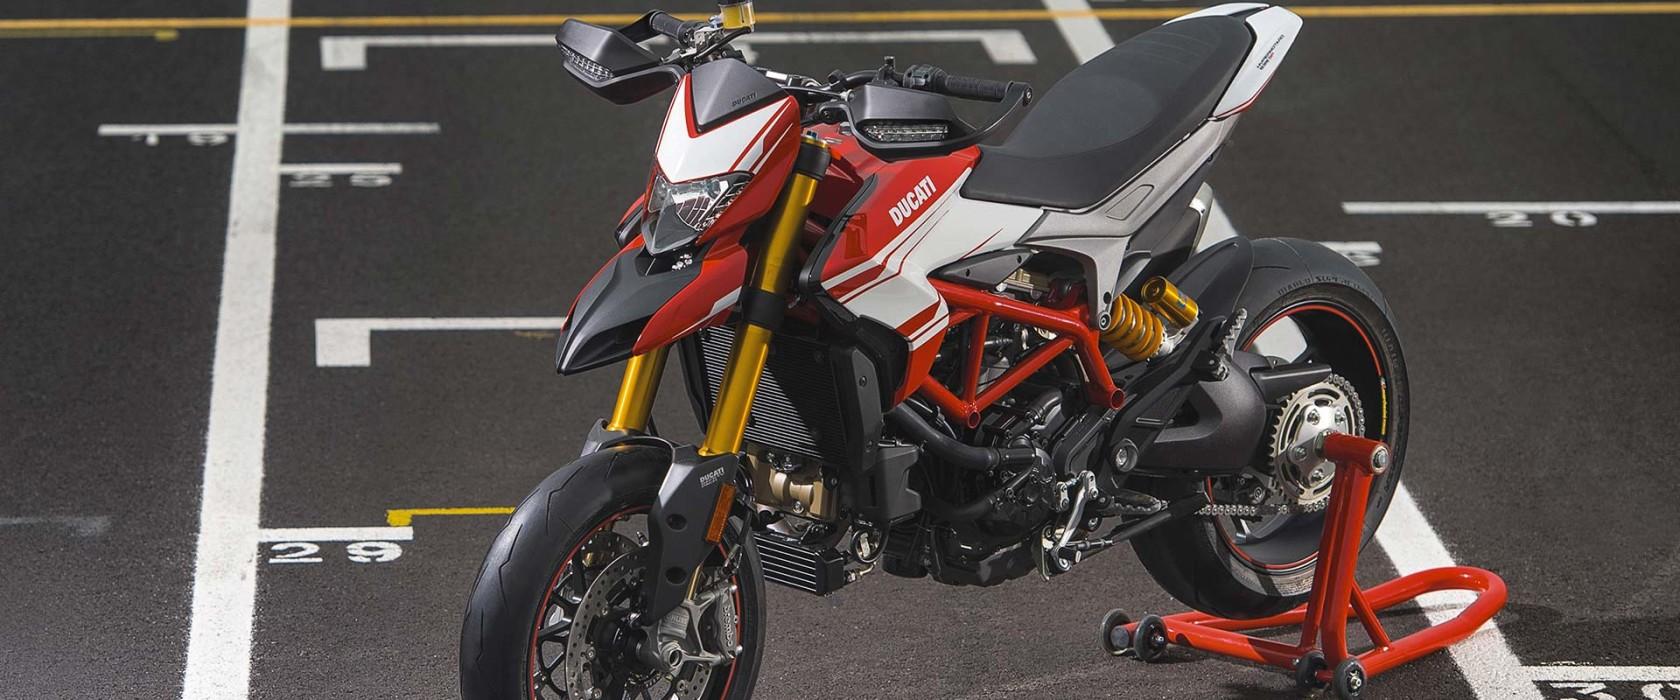 DucatiHypermotard939-004